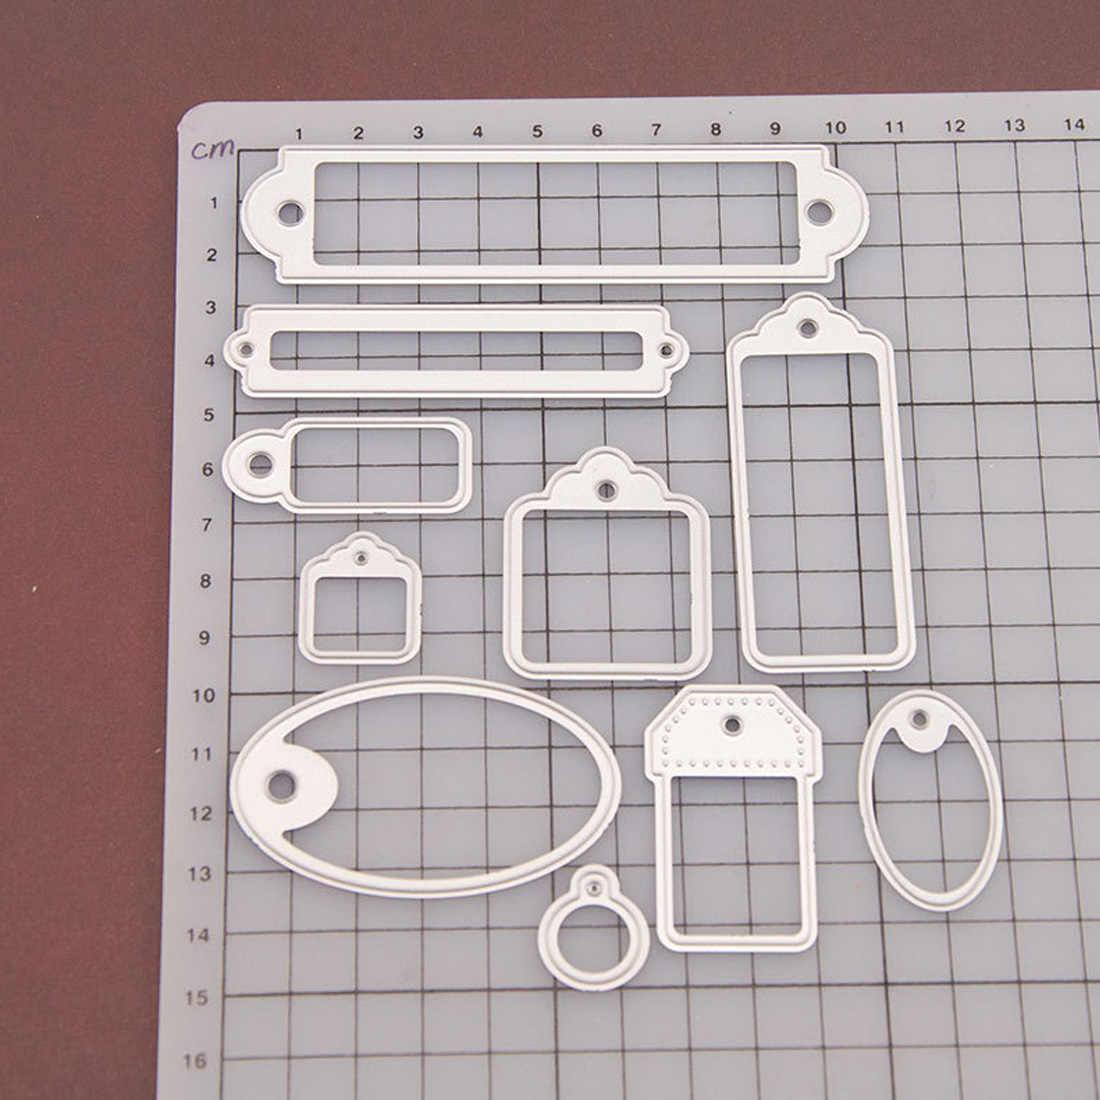 10Pcs Carbon Steel Silver Label Cutting Dies Stencils for DIY Scrapbooking Album Paper Card Decorative Craft Embossing Die Cuts